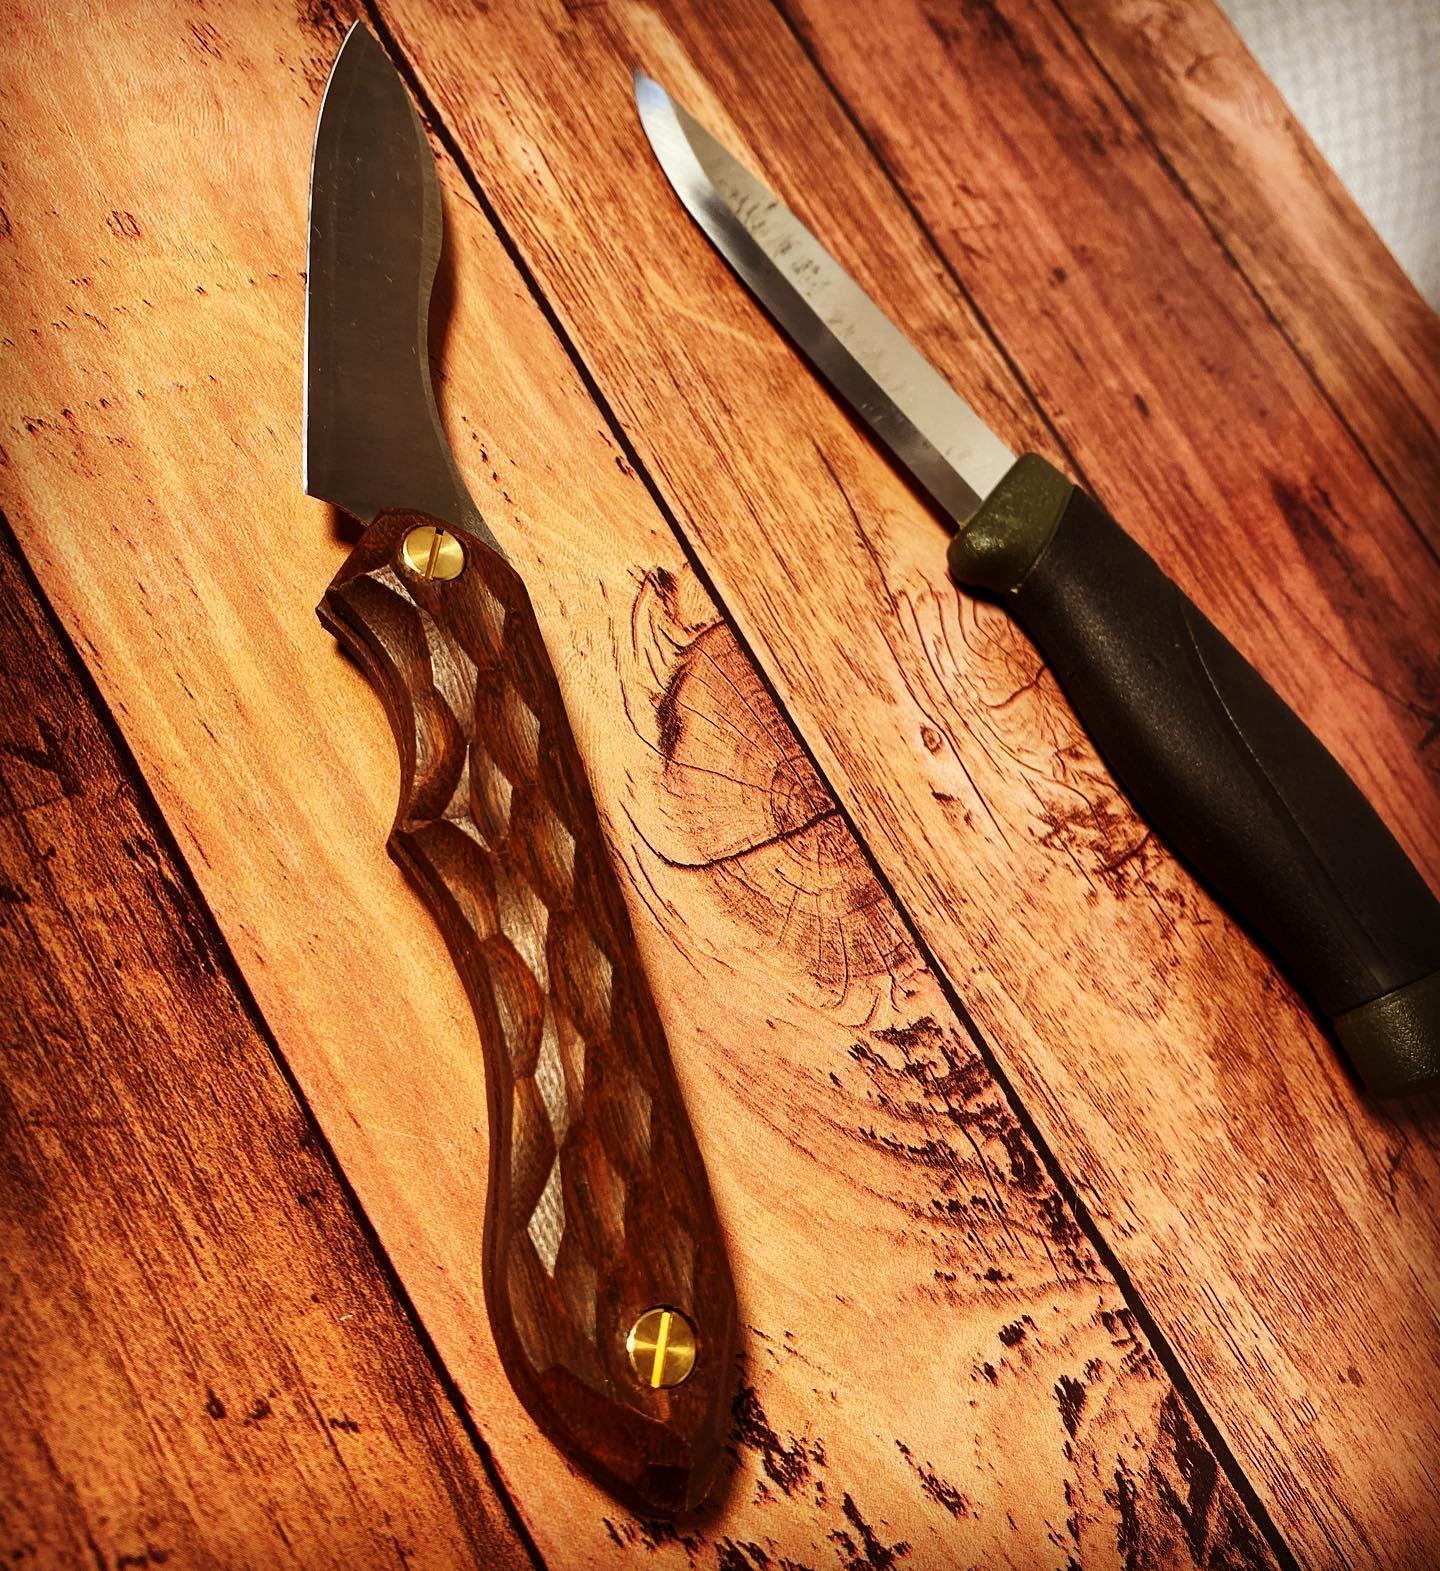 FEDECA折畳式料理ナイフが届いたのでサロンらしくレビューをまとめてみた